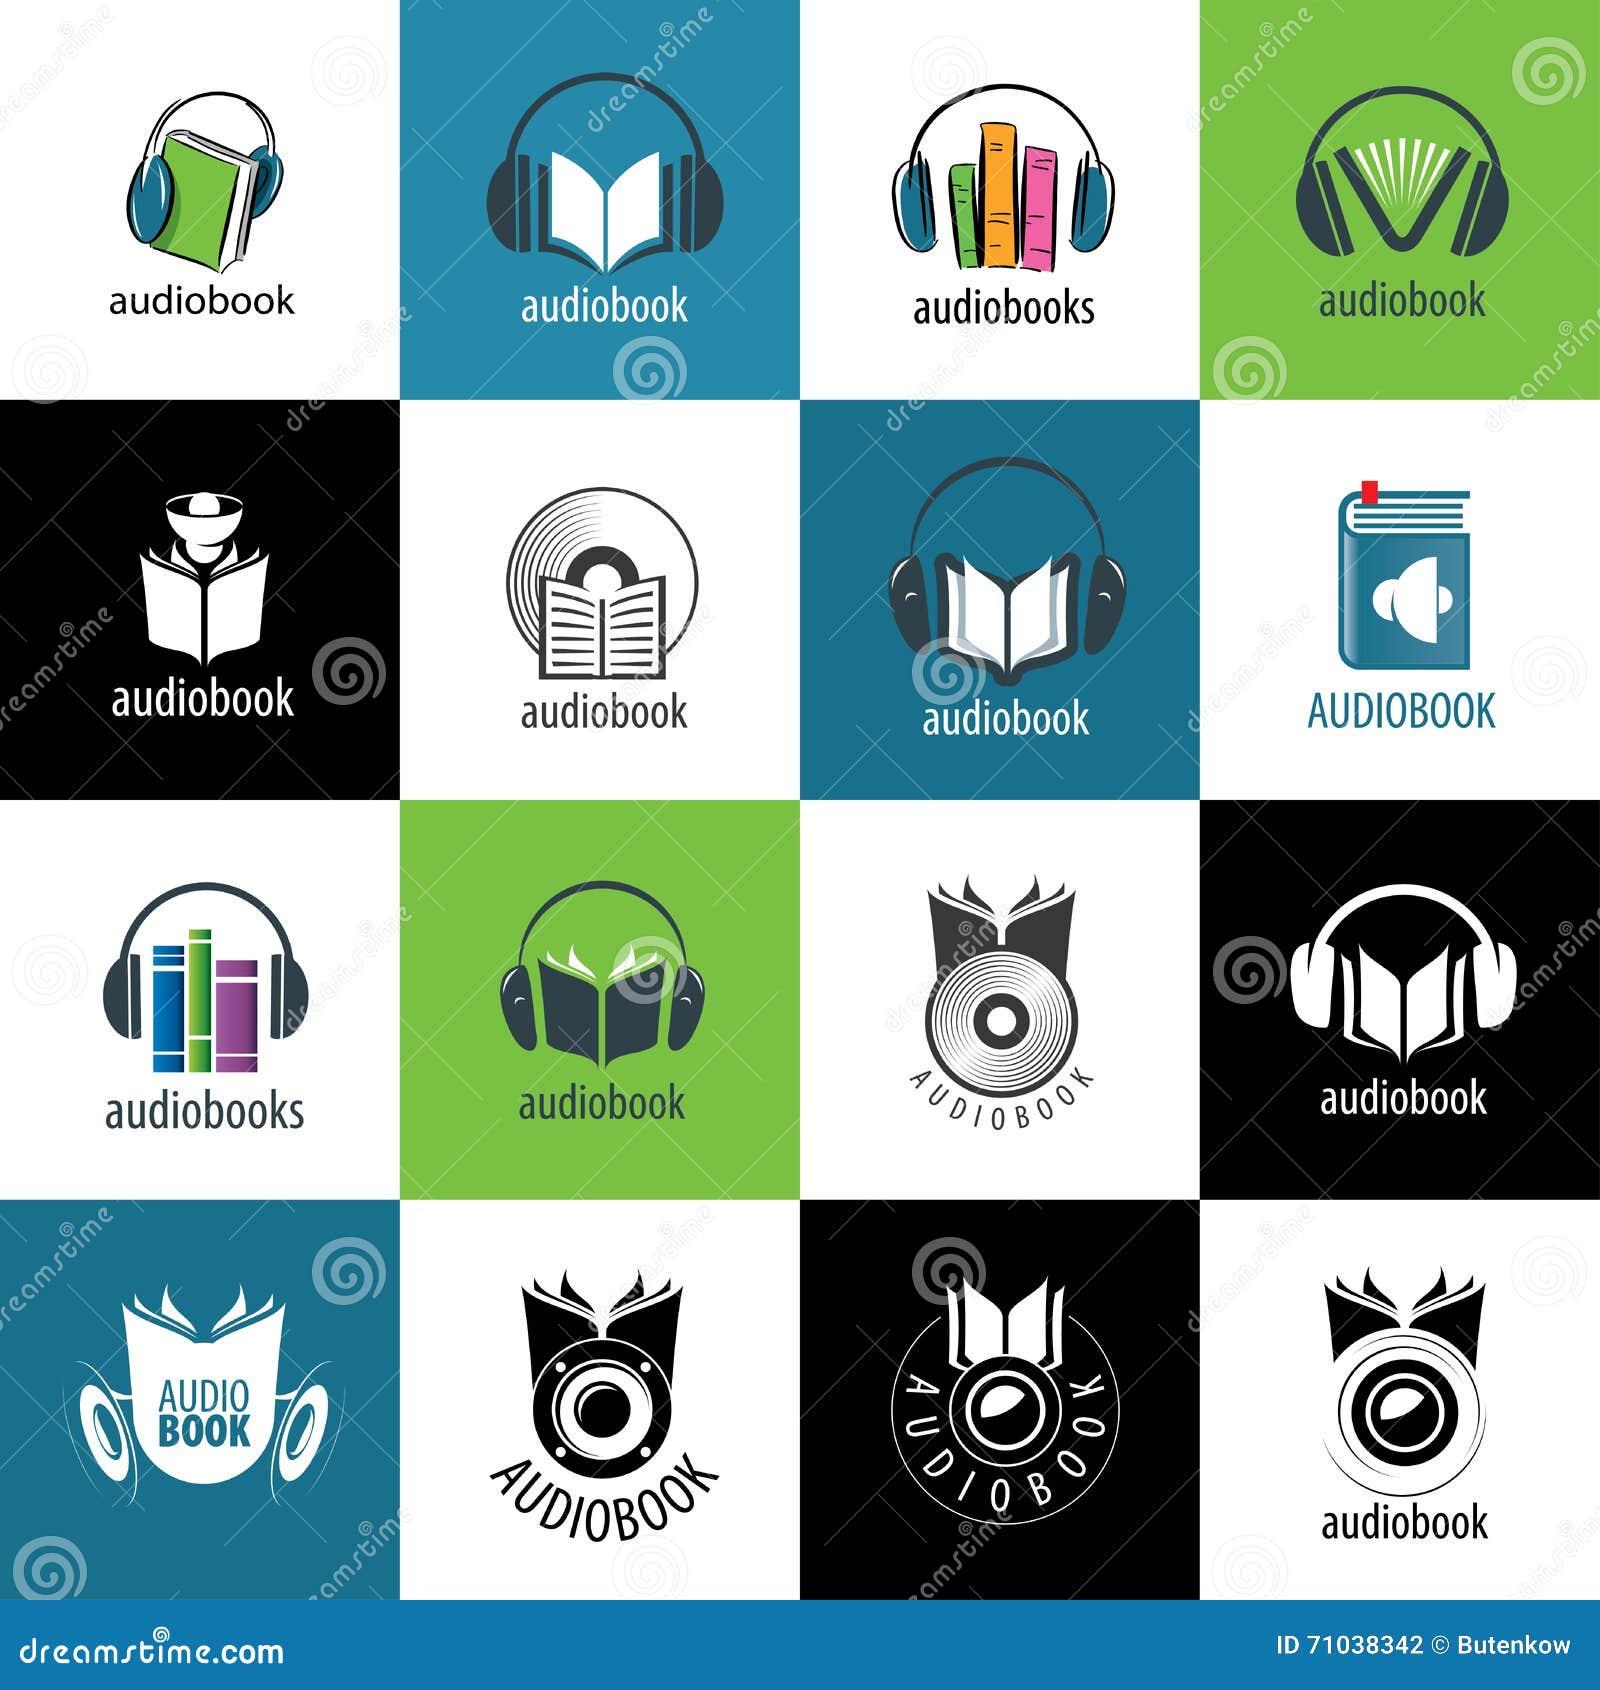 audiobook vector logo template stock vector illustration of